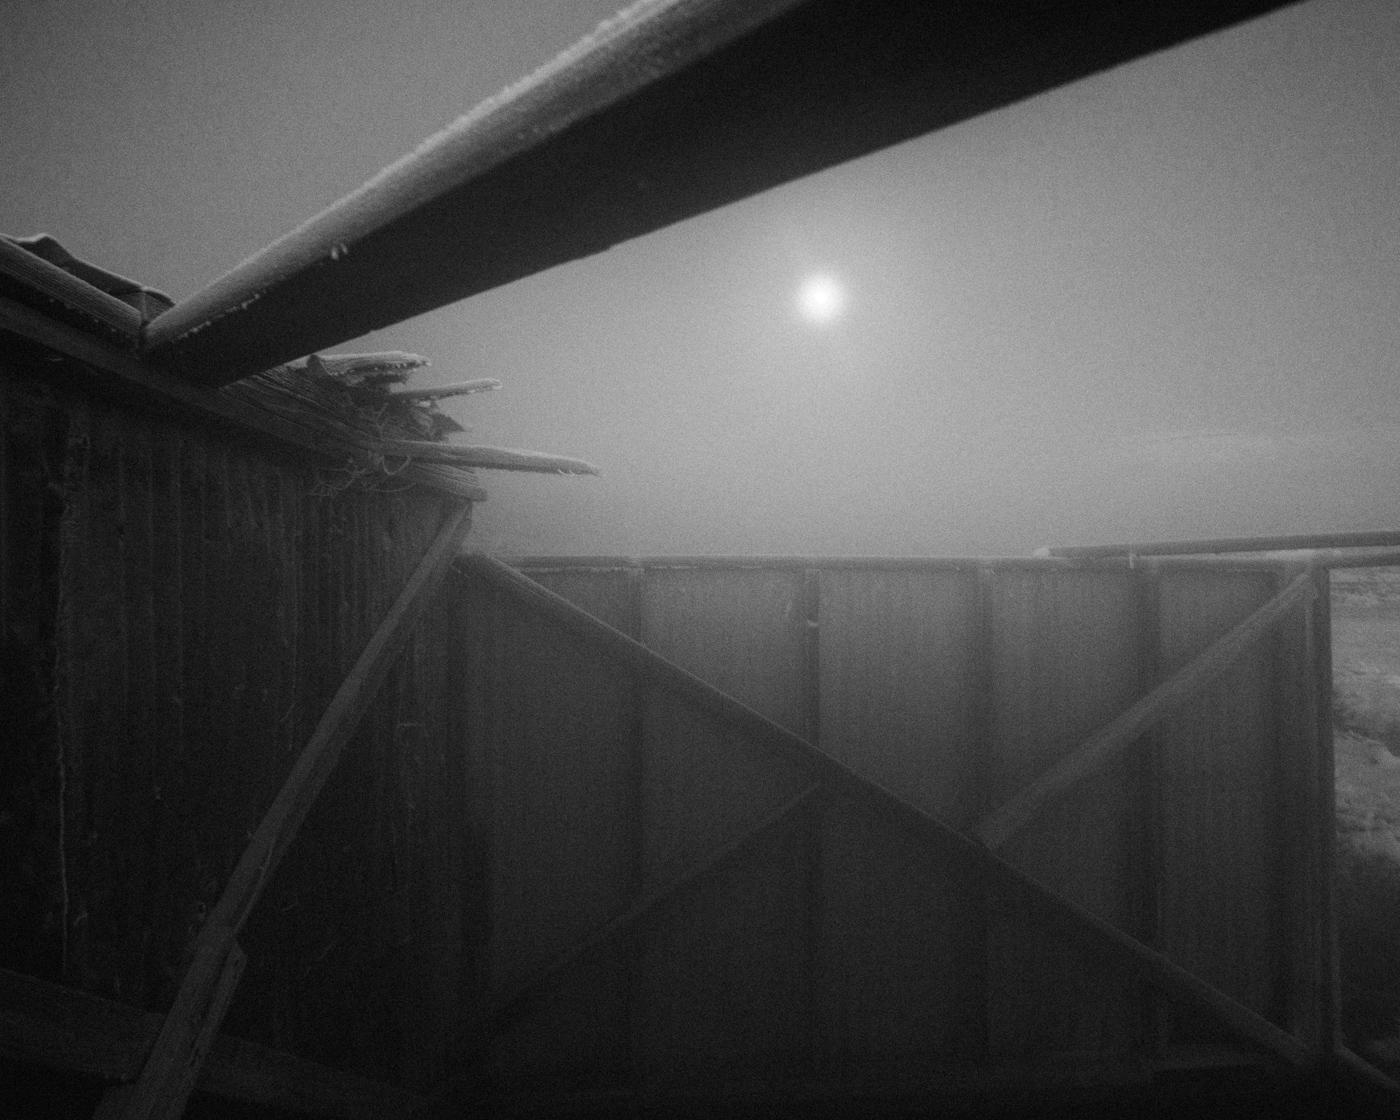 Moon from Hot Springs, November 2015